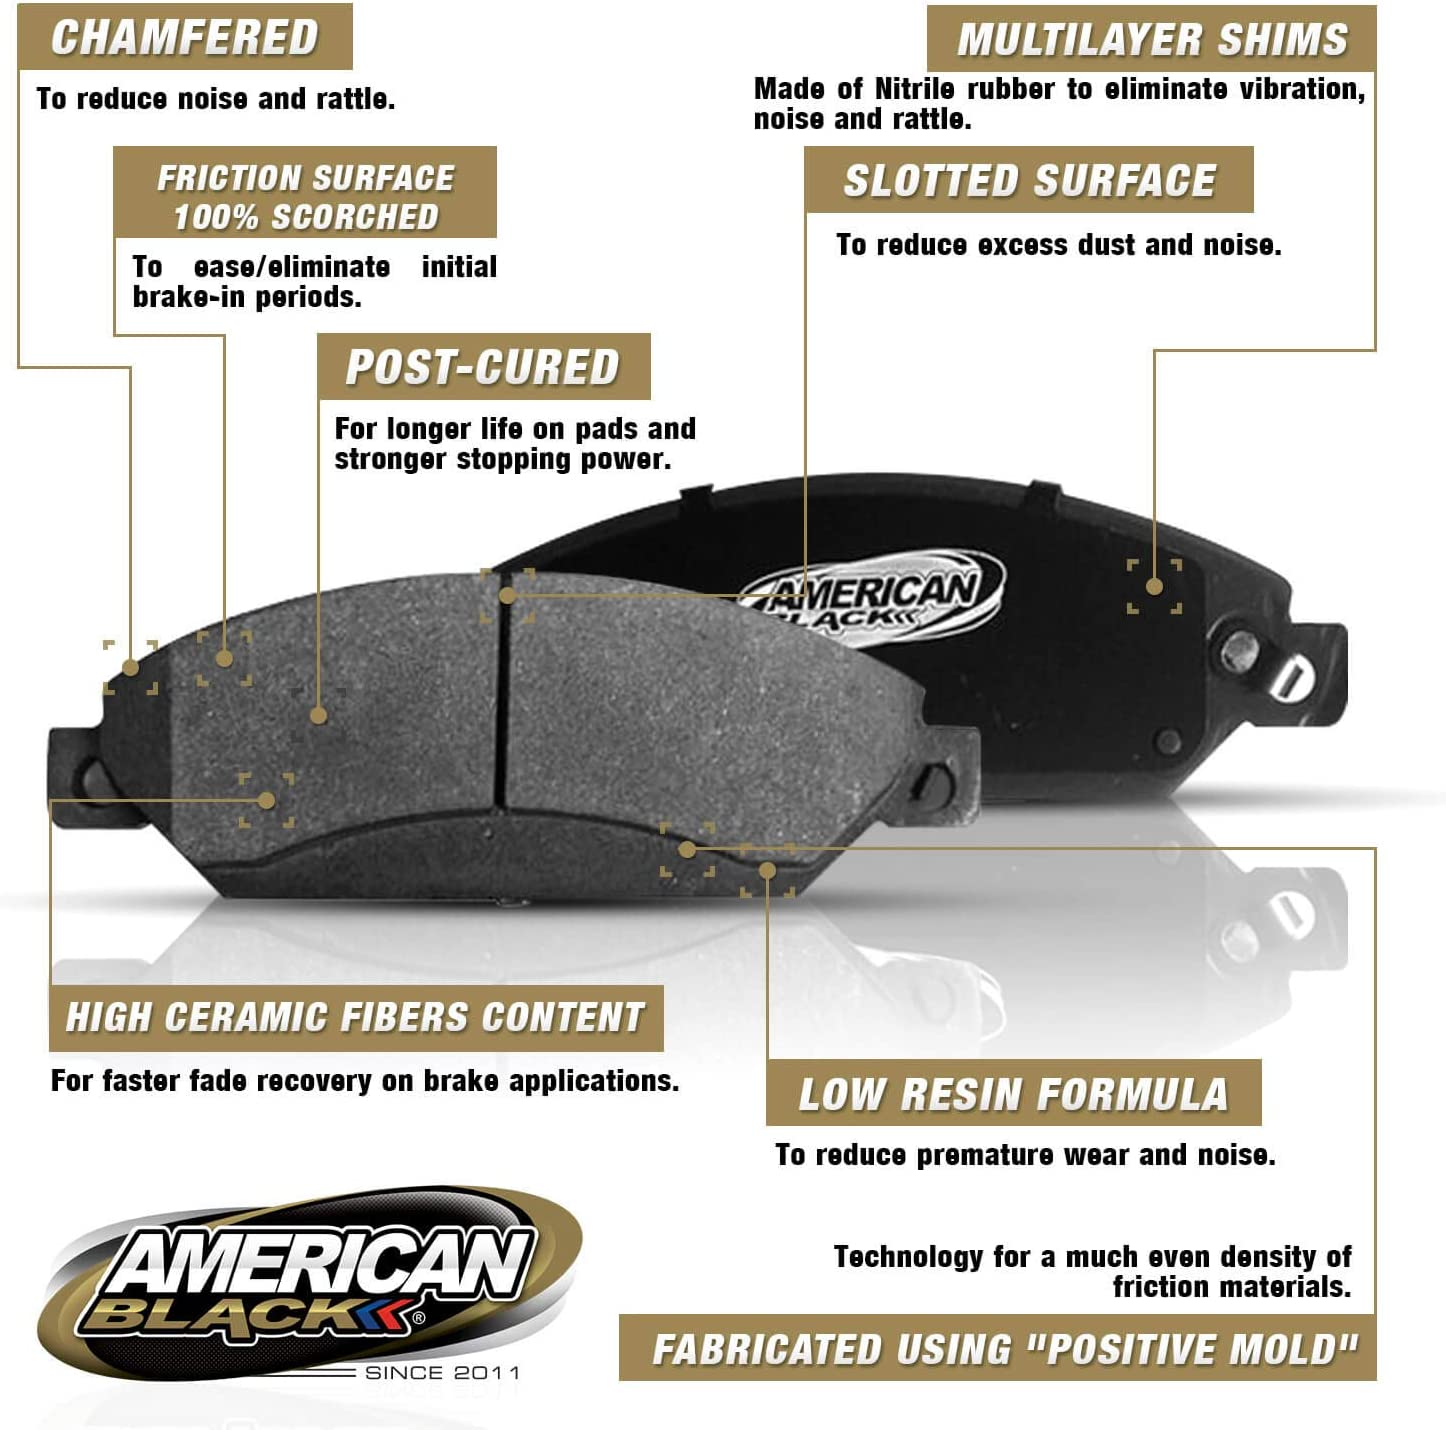 American Black ABD924C Professional Ceramic Front Disc Brake Pad Set Compatible With Hyundai Elantra//Sonata//Tiburon//Kia Optima /& Others OE Premium Quality Quiet and DUST FREE Perfect fit